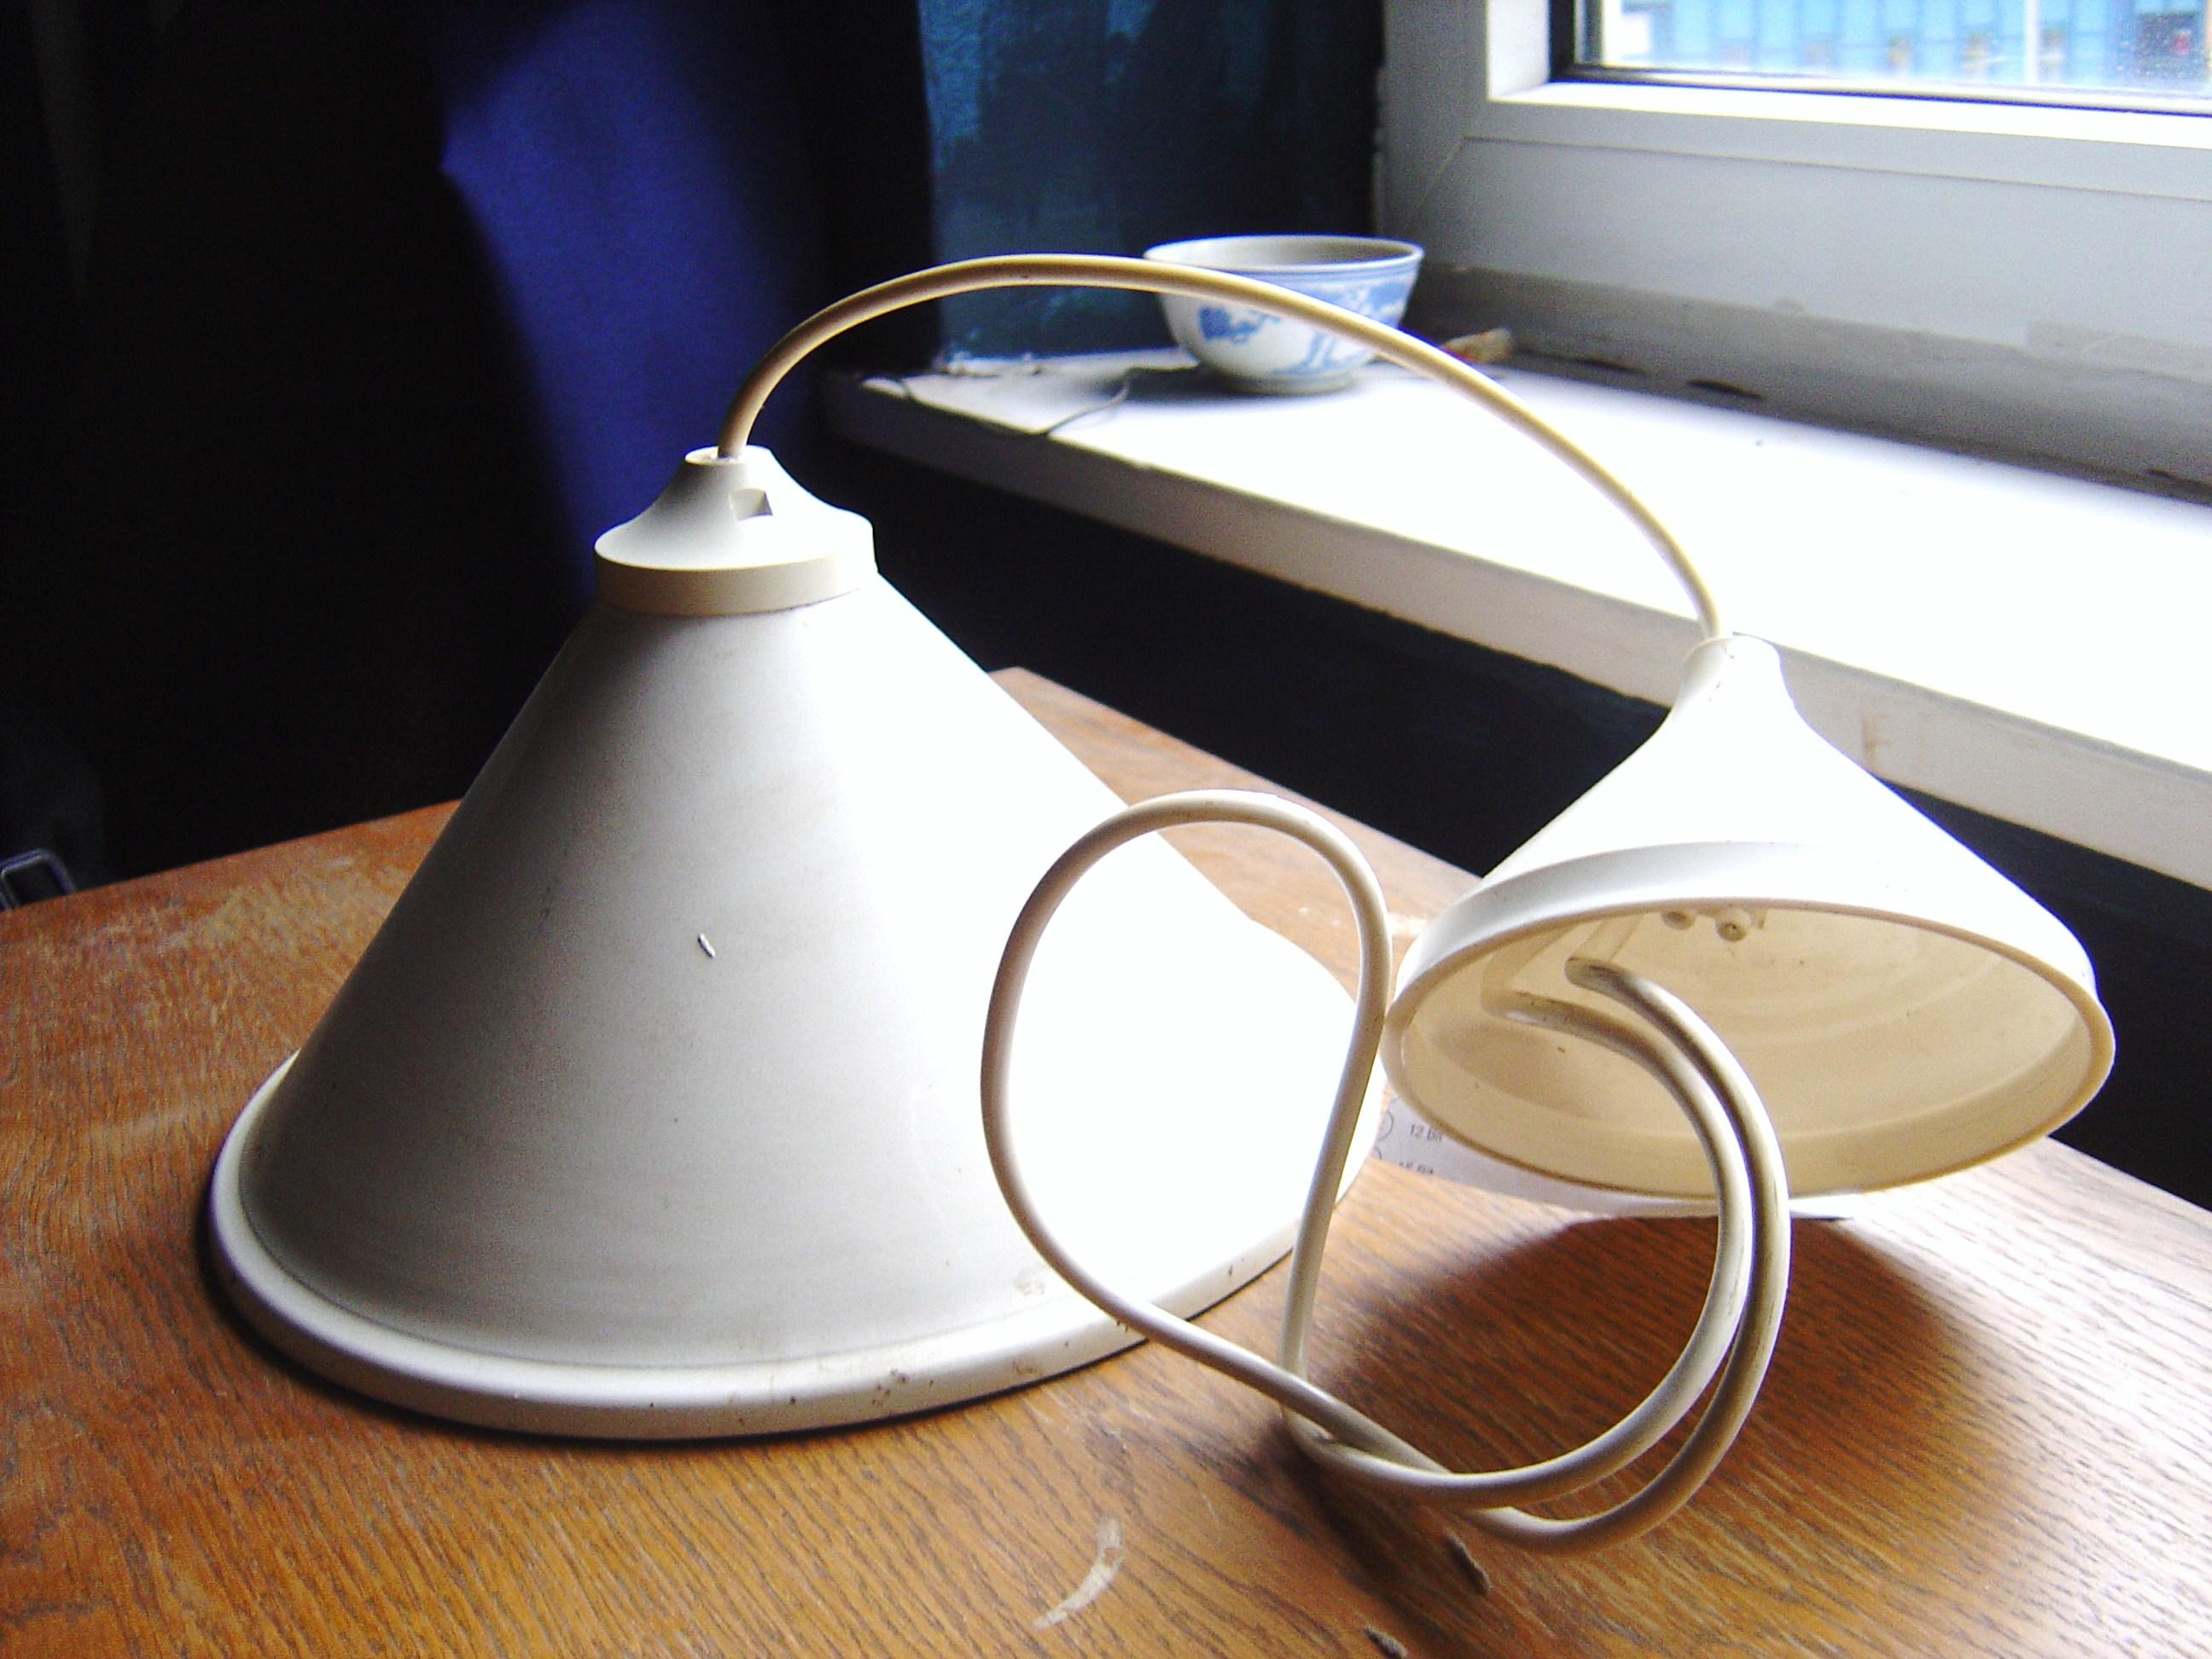 Tiffany Lampen Amsterdam : Kleinanzeigen gardinen lampen jalousien